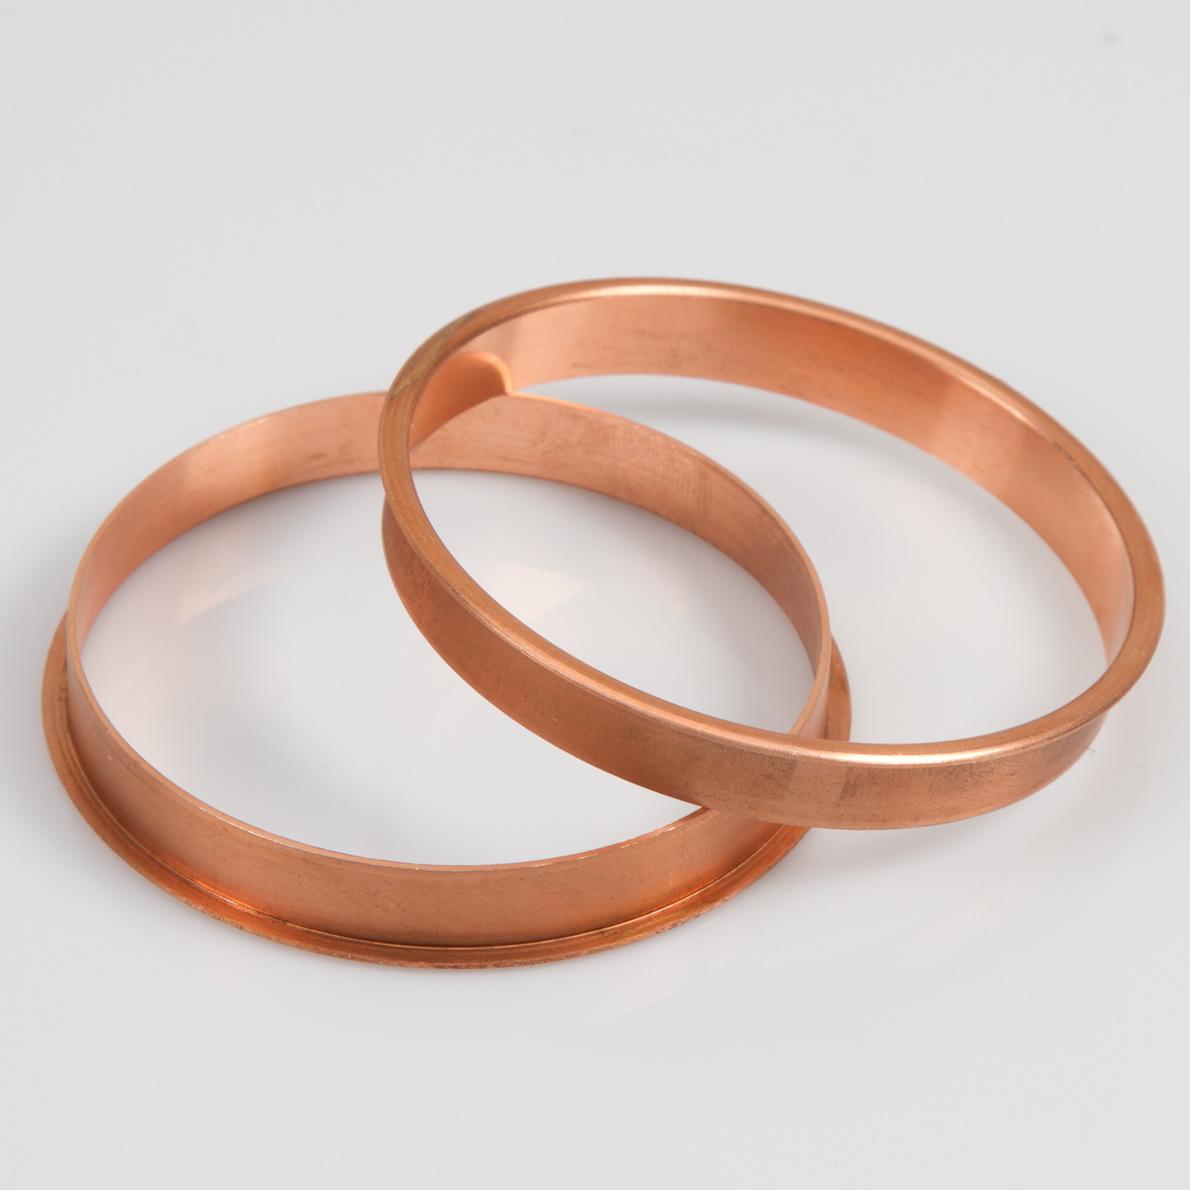 copper bangle bracelet kit size 8 5 at penn state industries